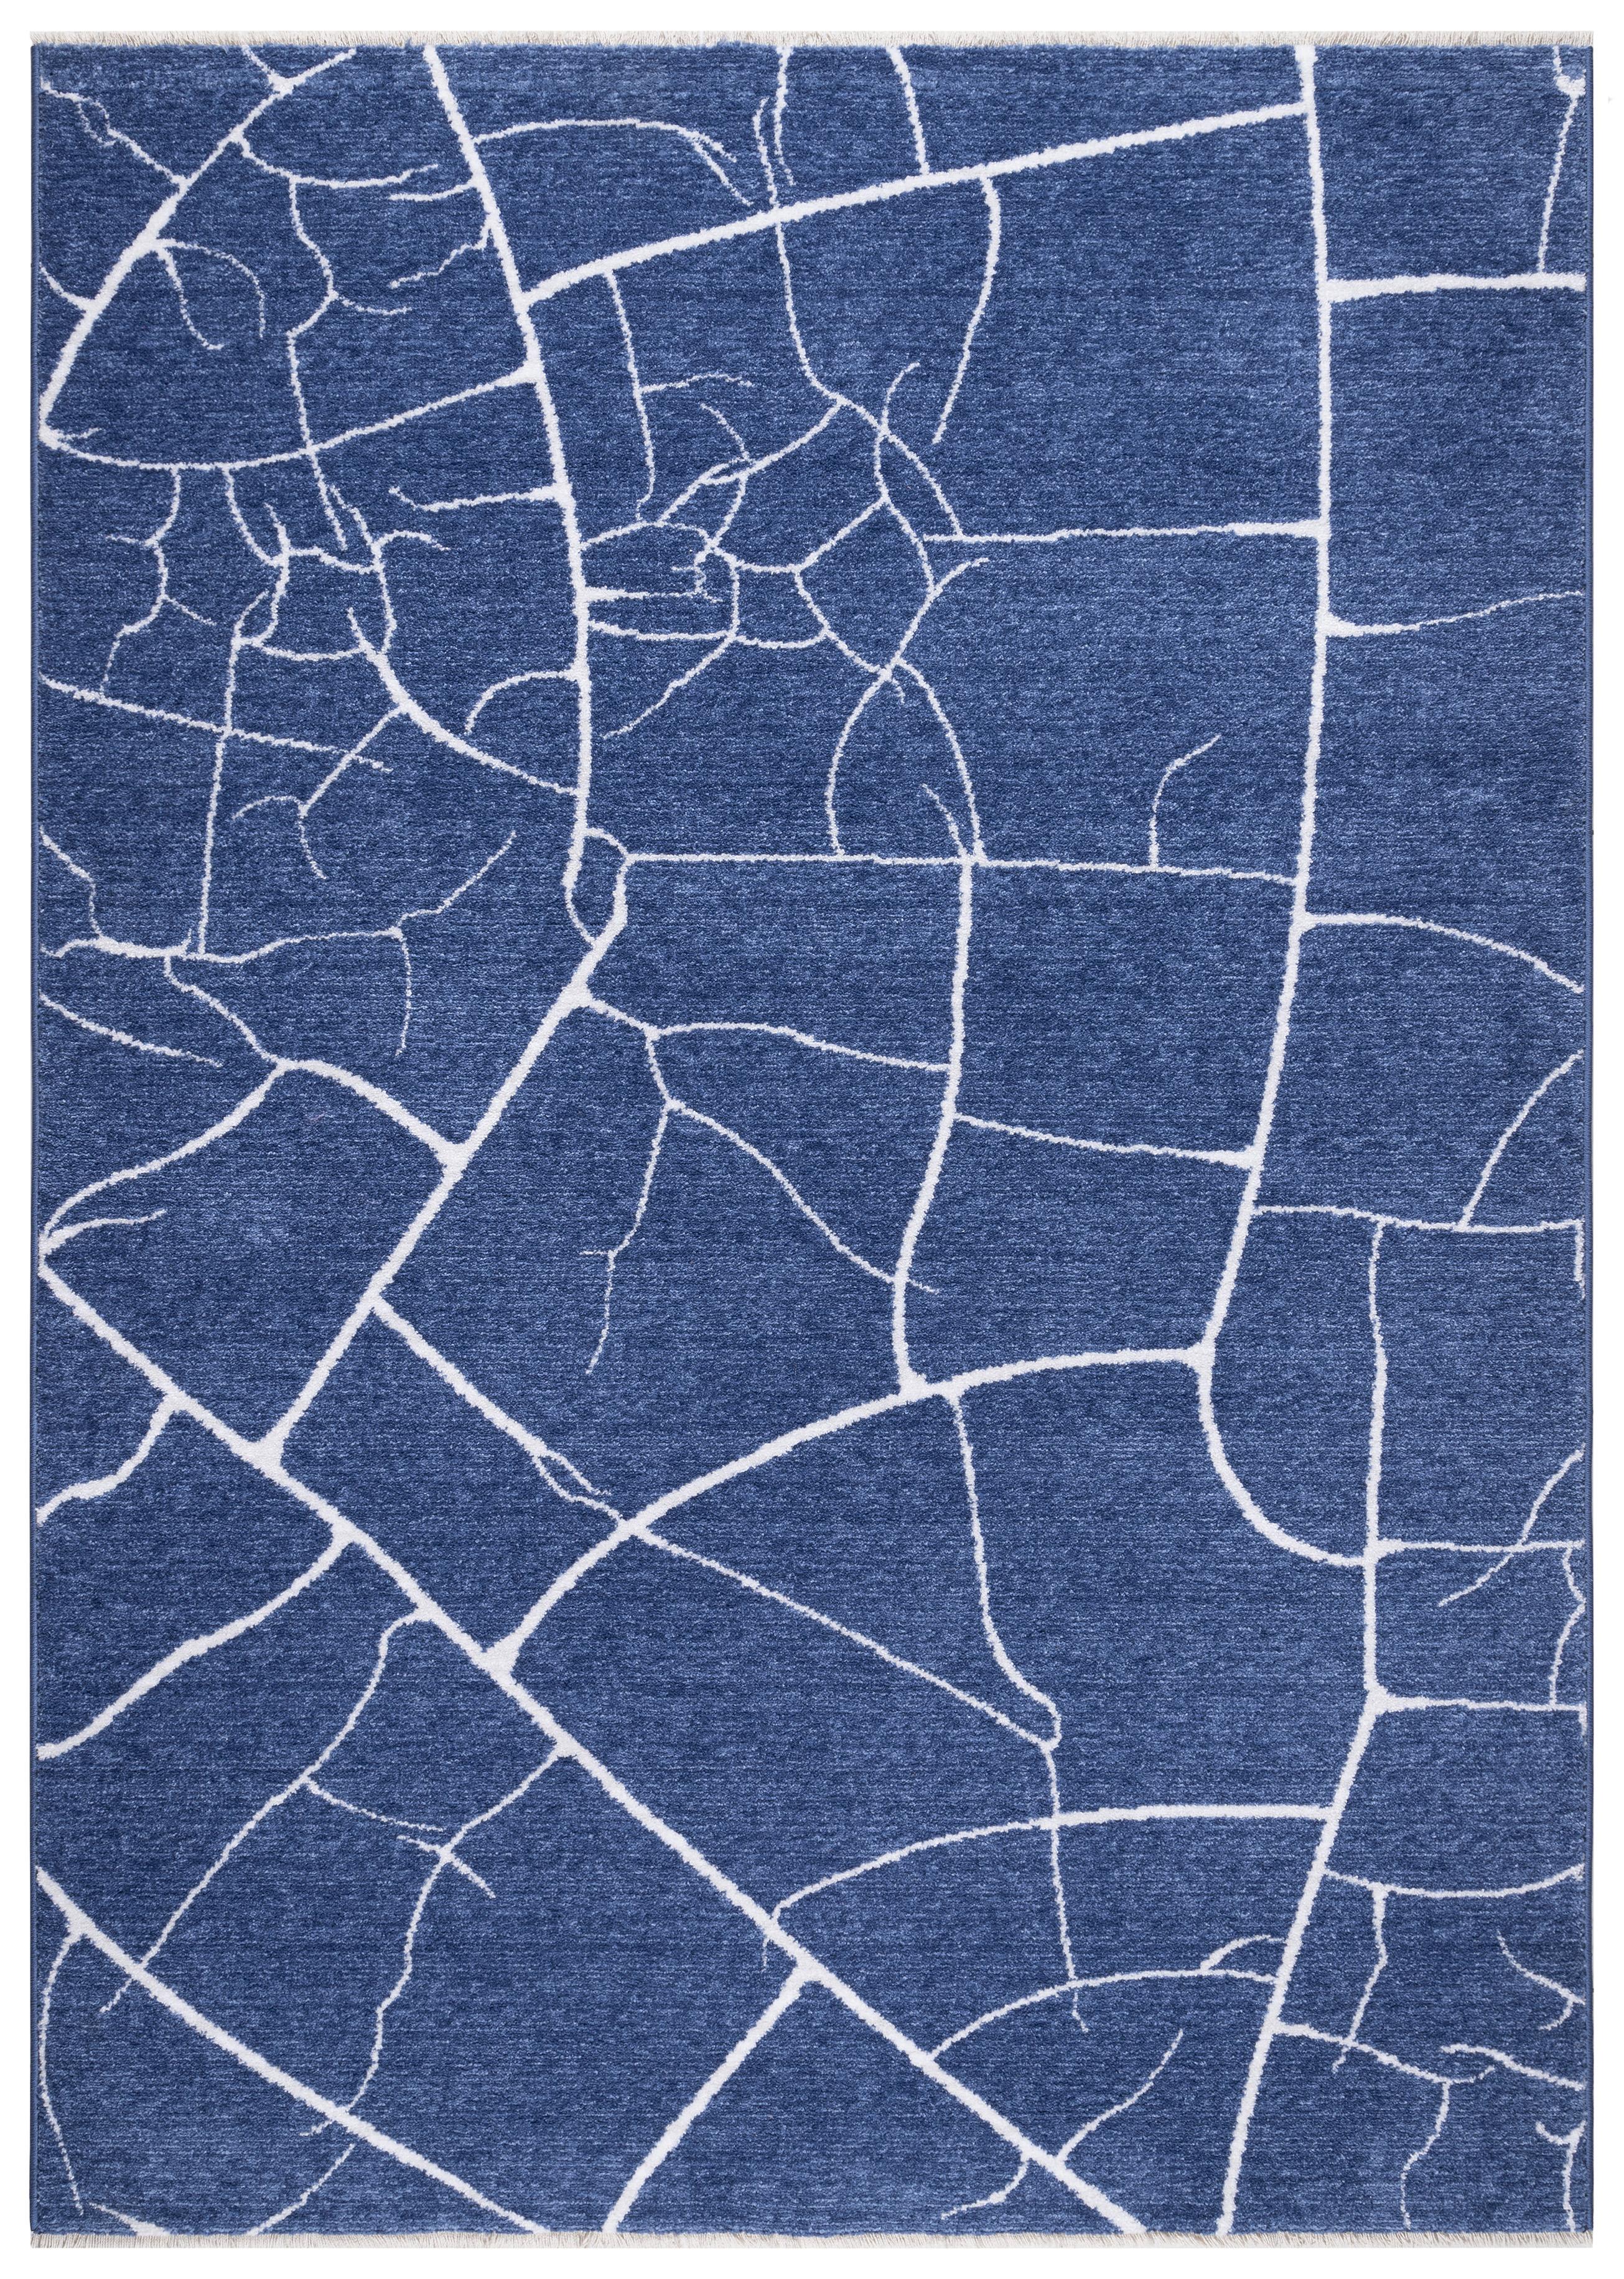 6068A S.BLUE SILVER